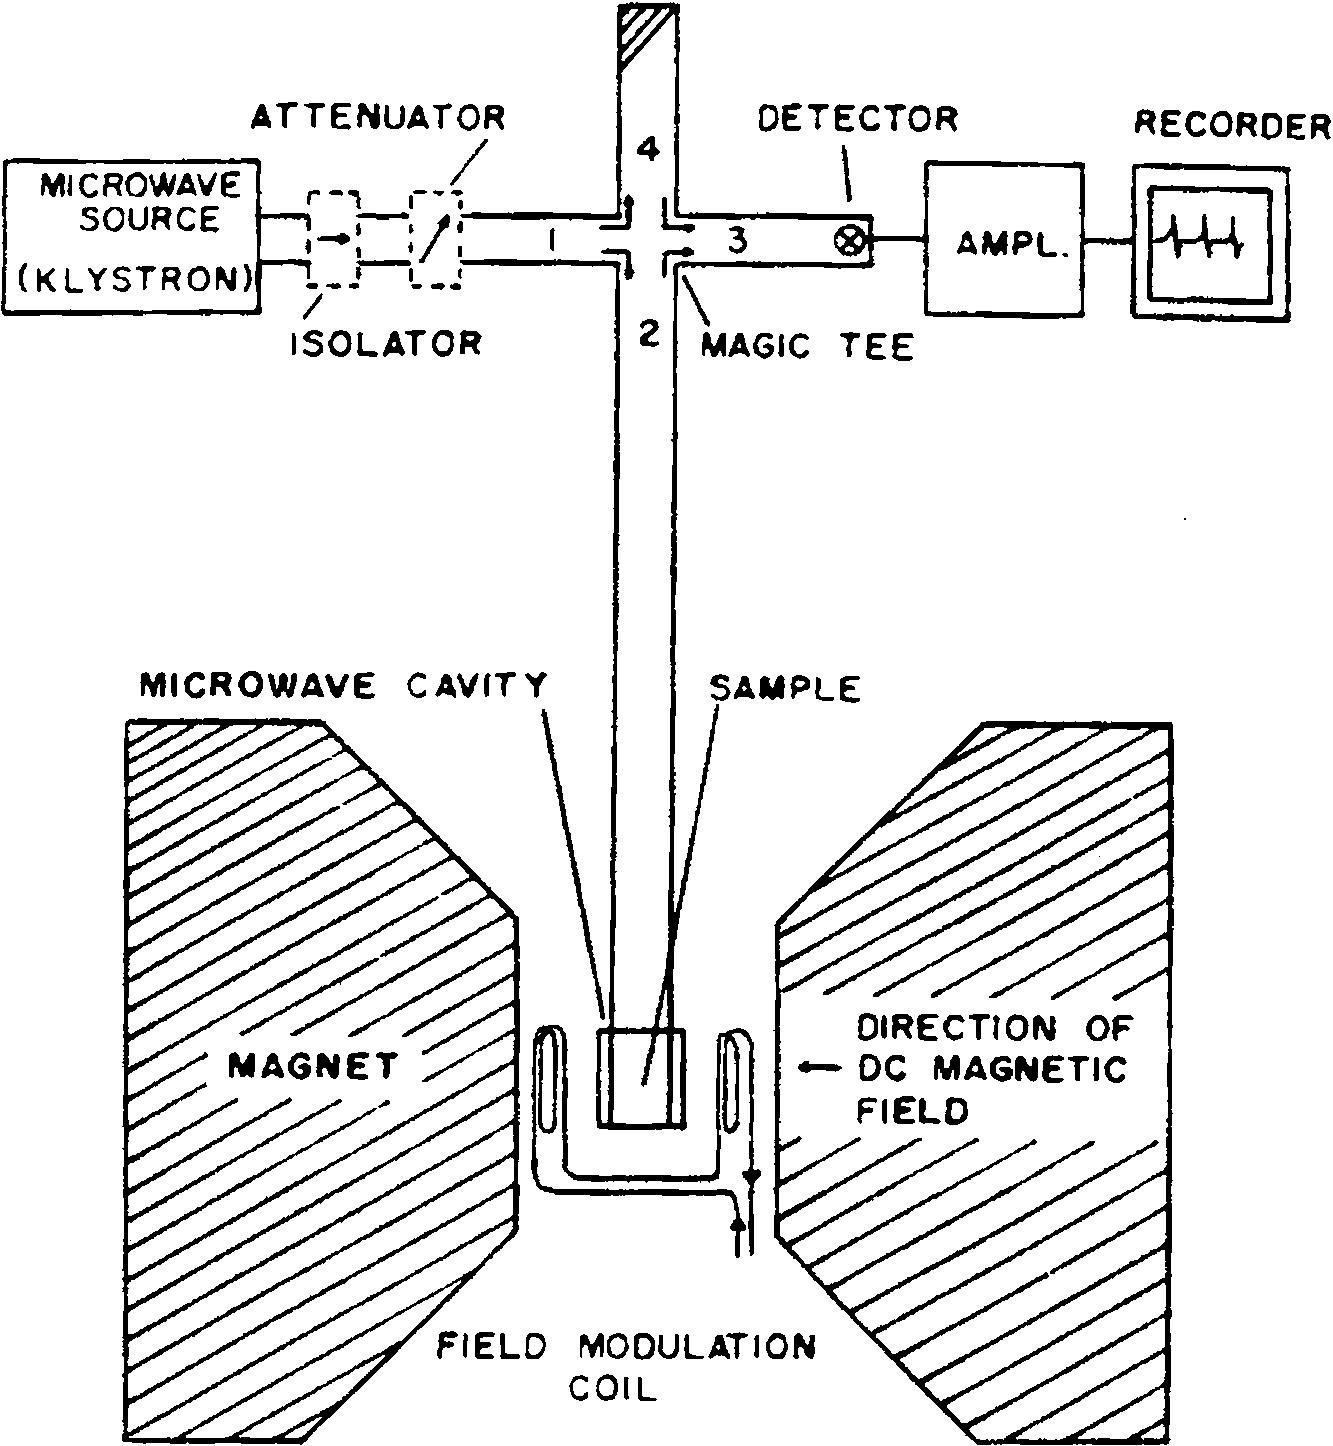 limitations of esr spectroscopy